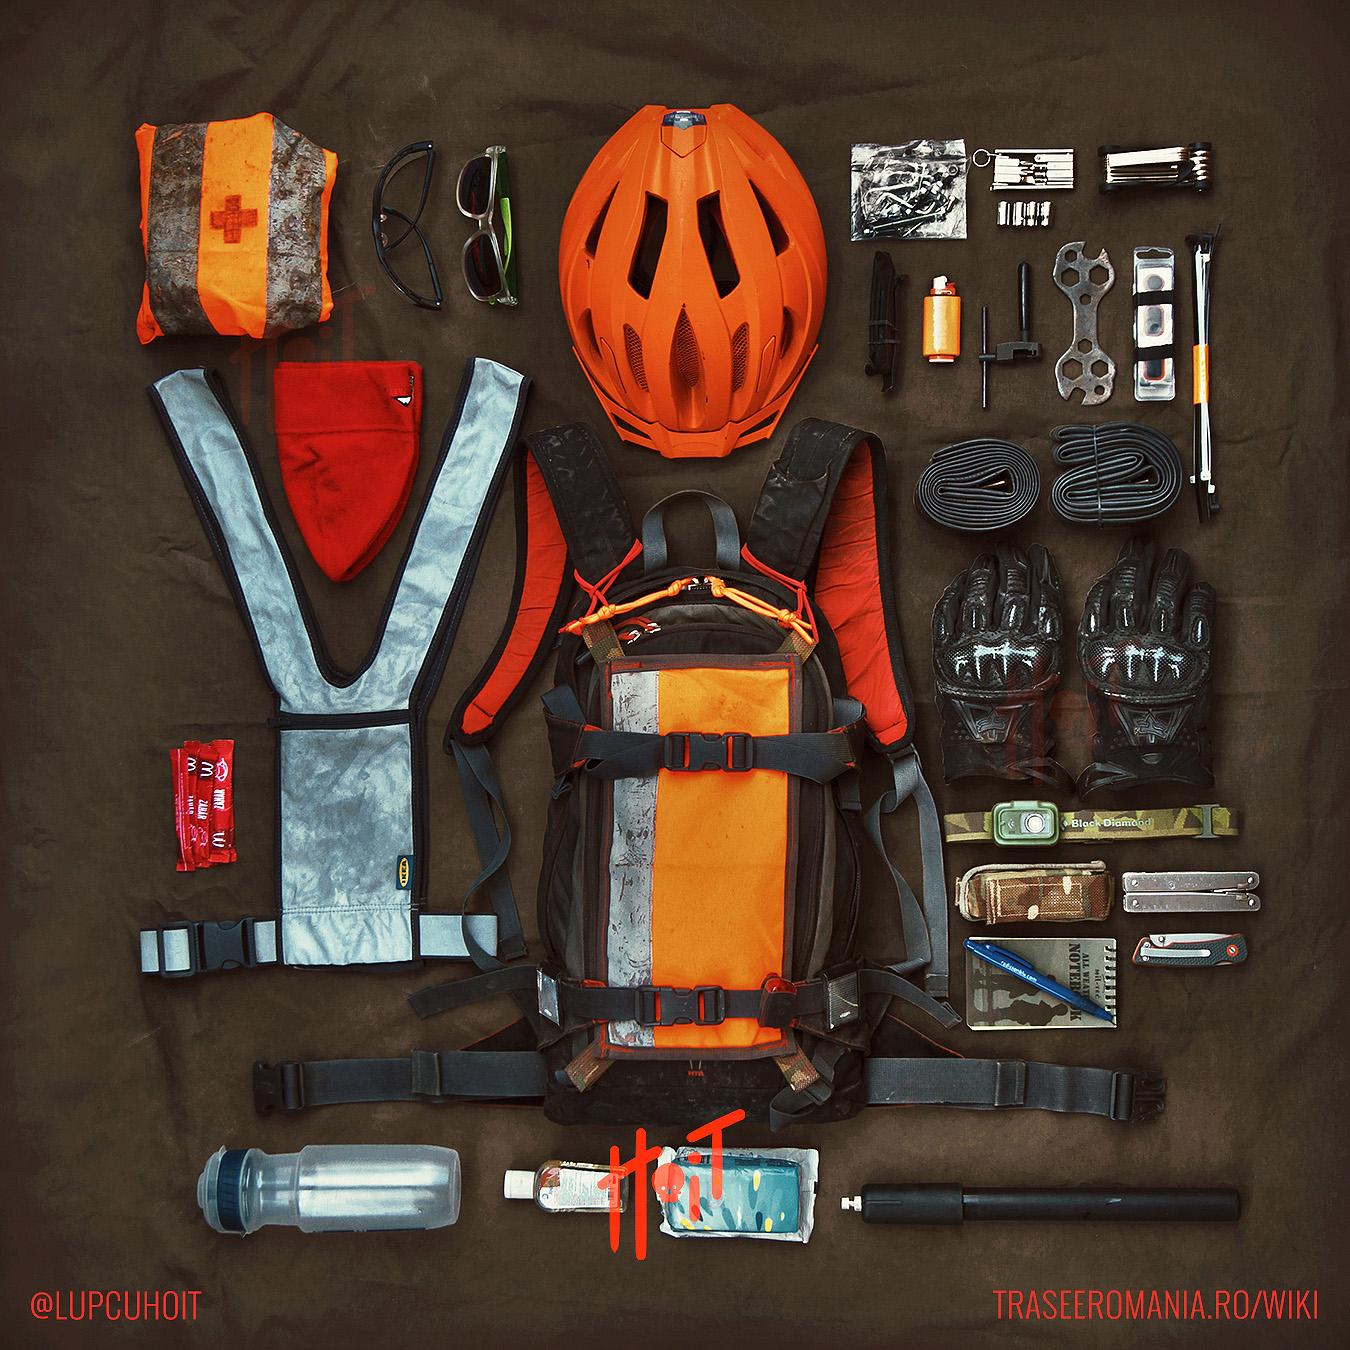 Echimapent bicicleta pentru ture montane, enduro sau cross country